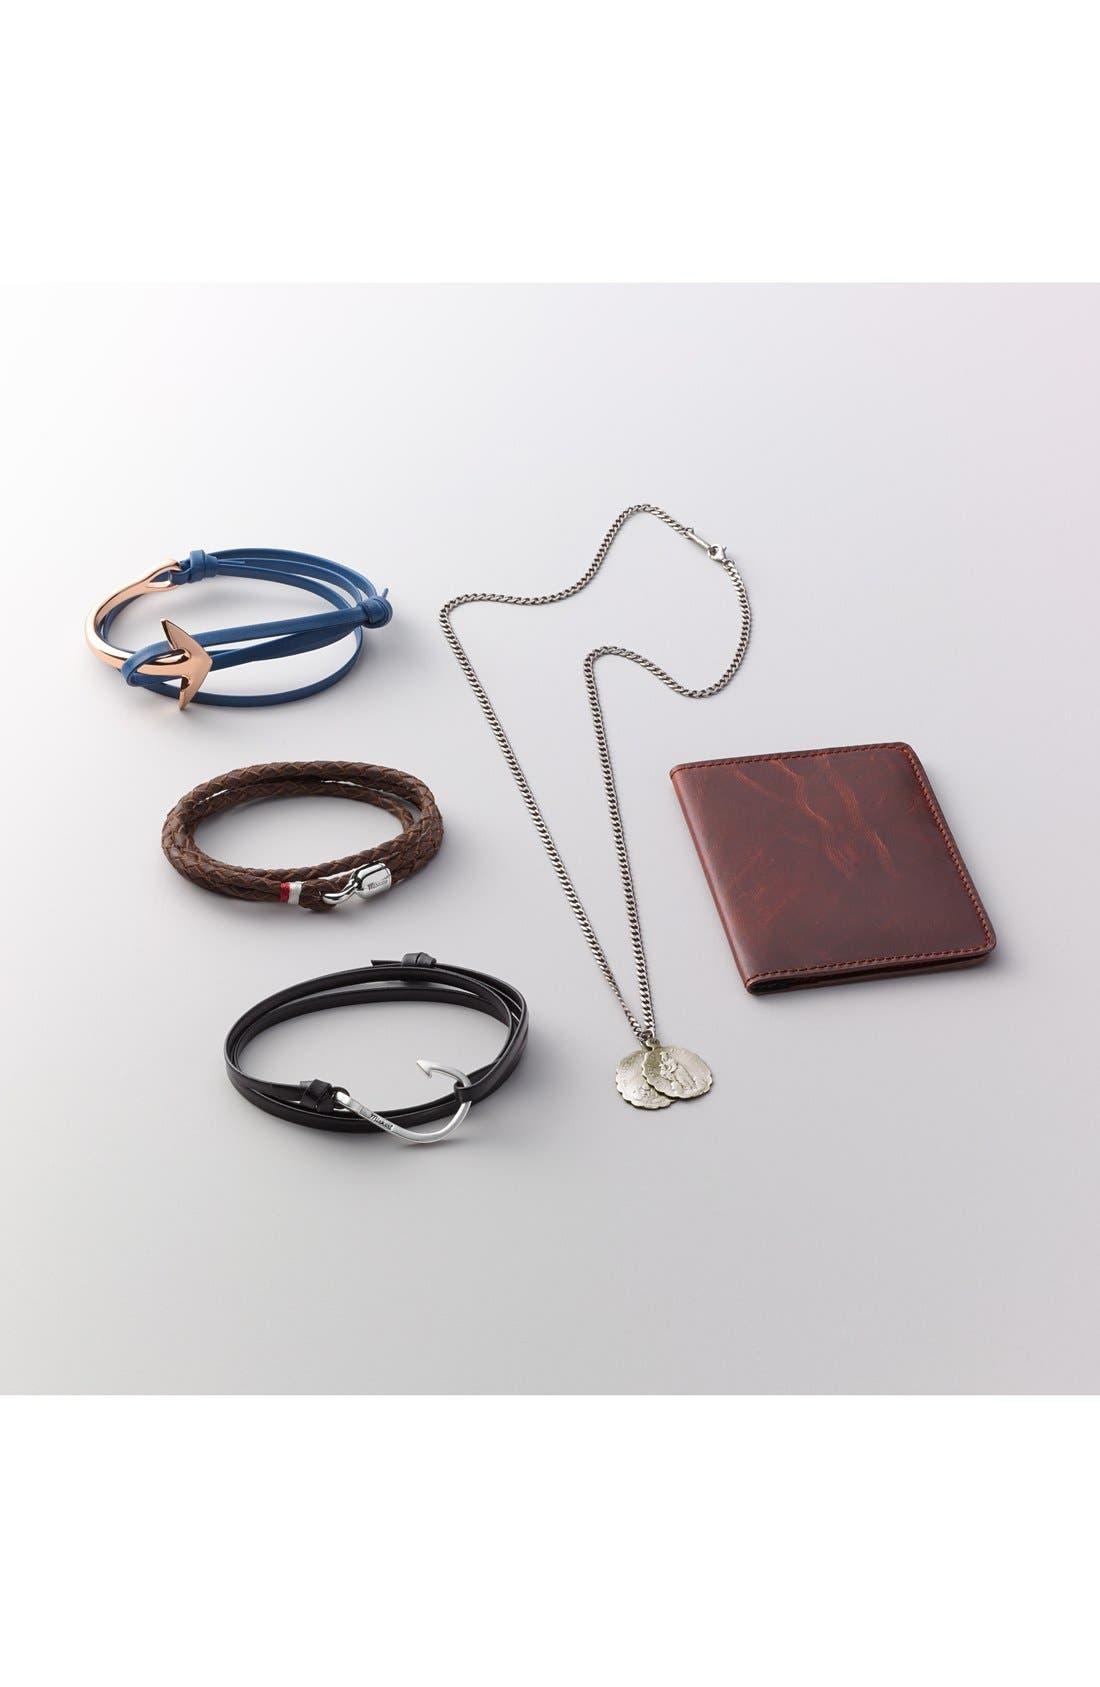 Silver Hook Leather Bracelet,                             Alternate thumbnail 3, color,                             410